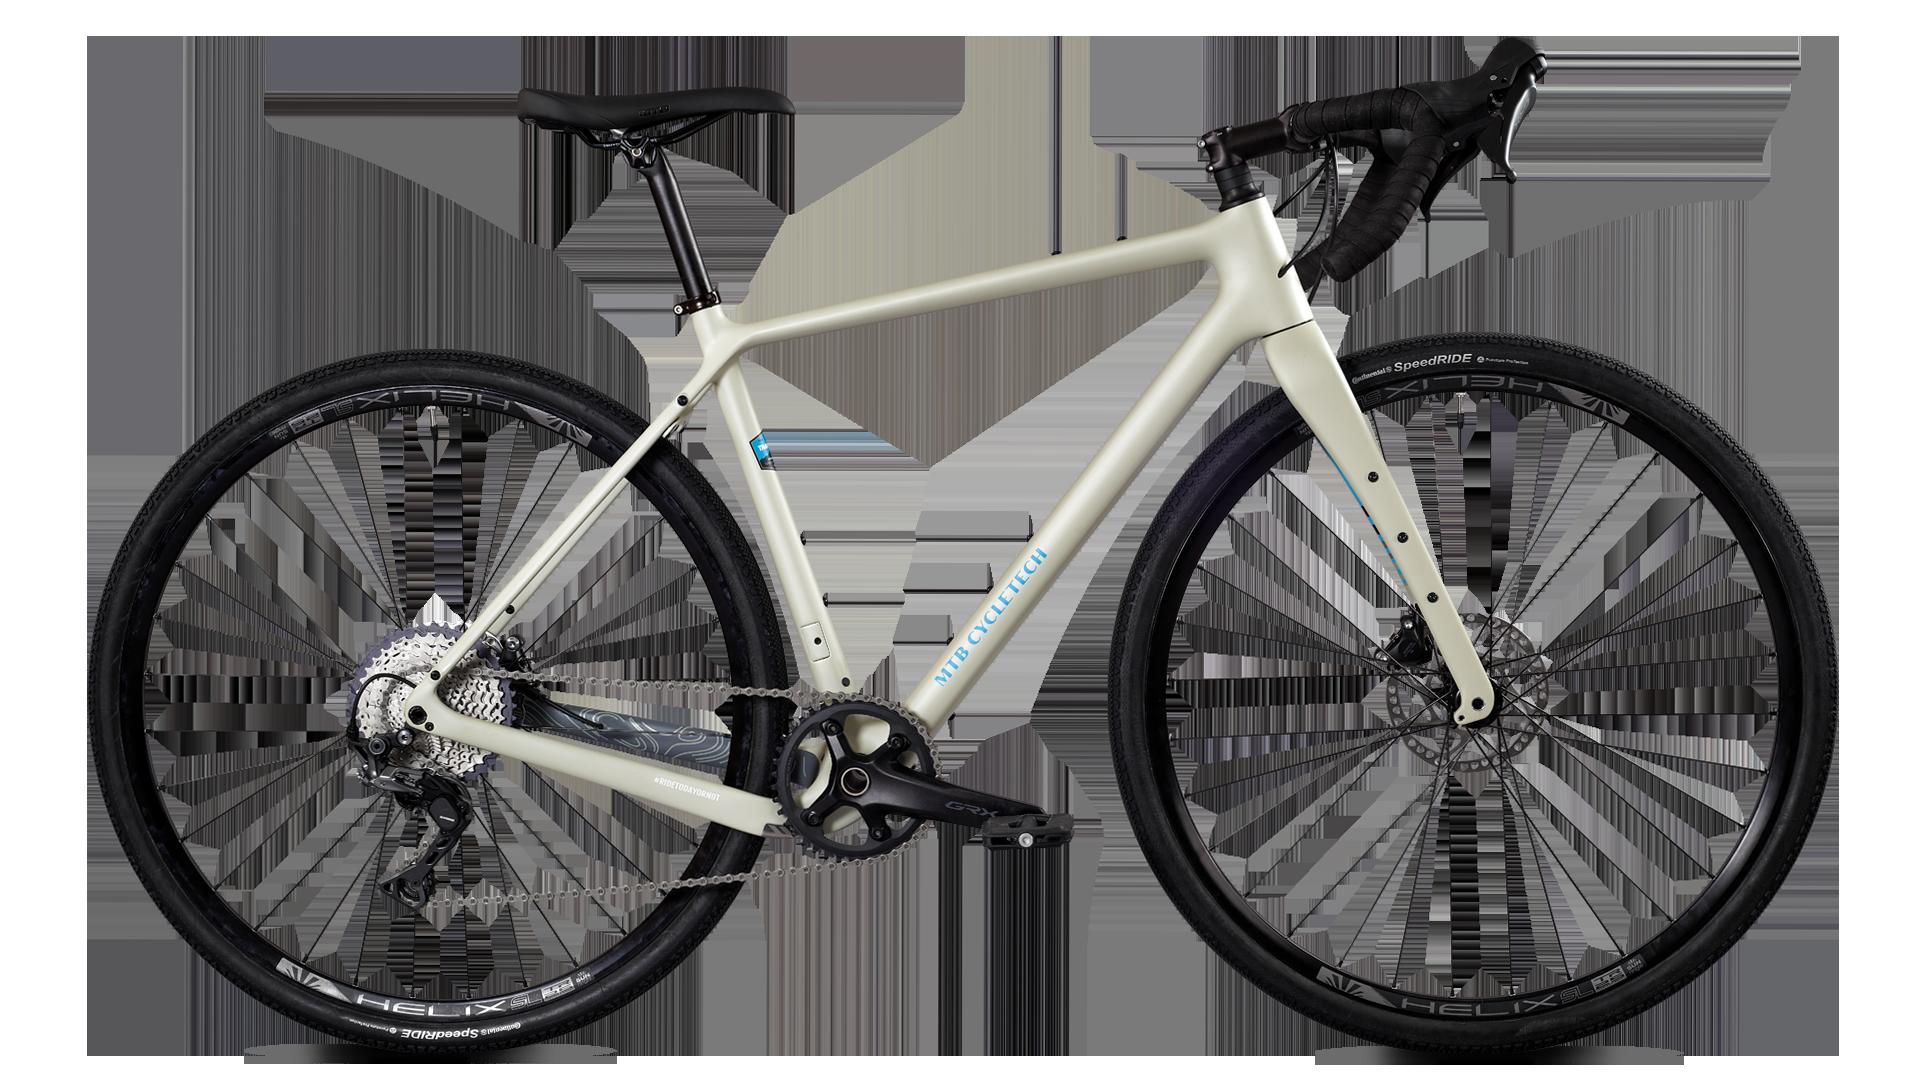 Modell - Traverse - MTB Cycletech